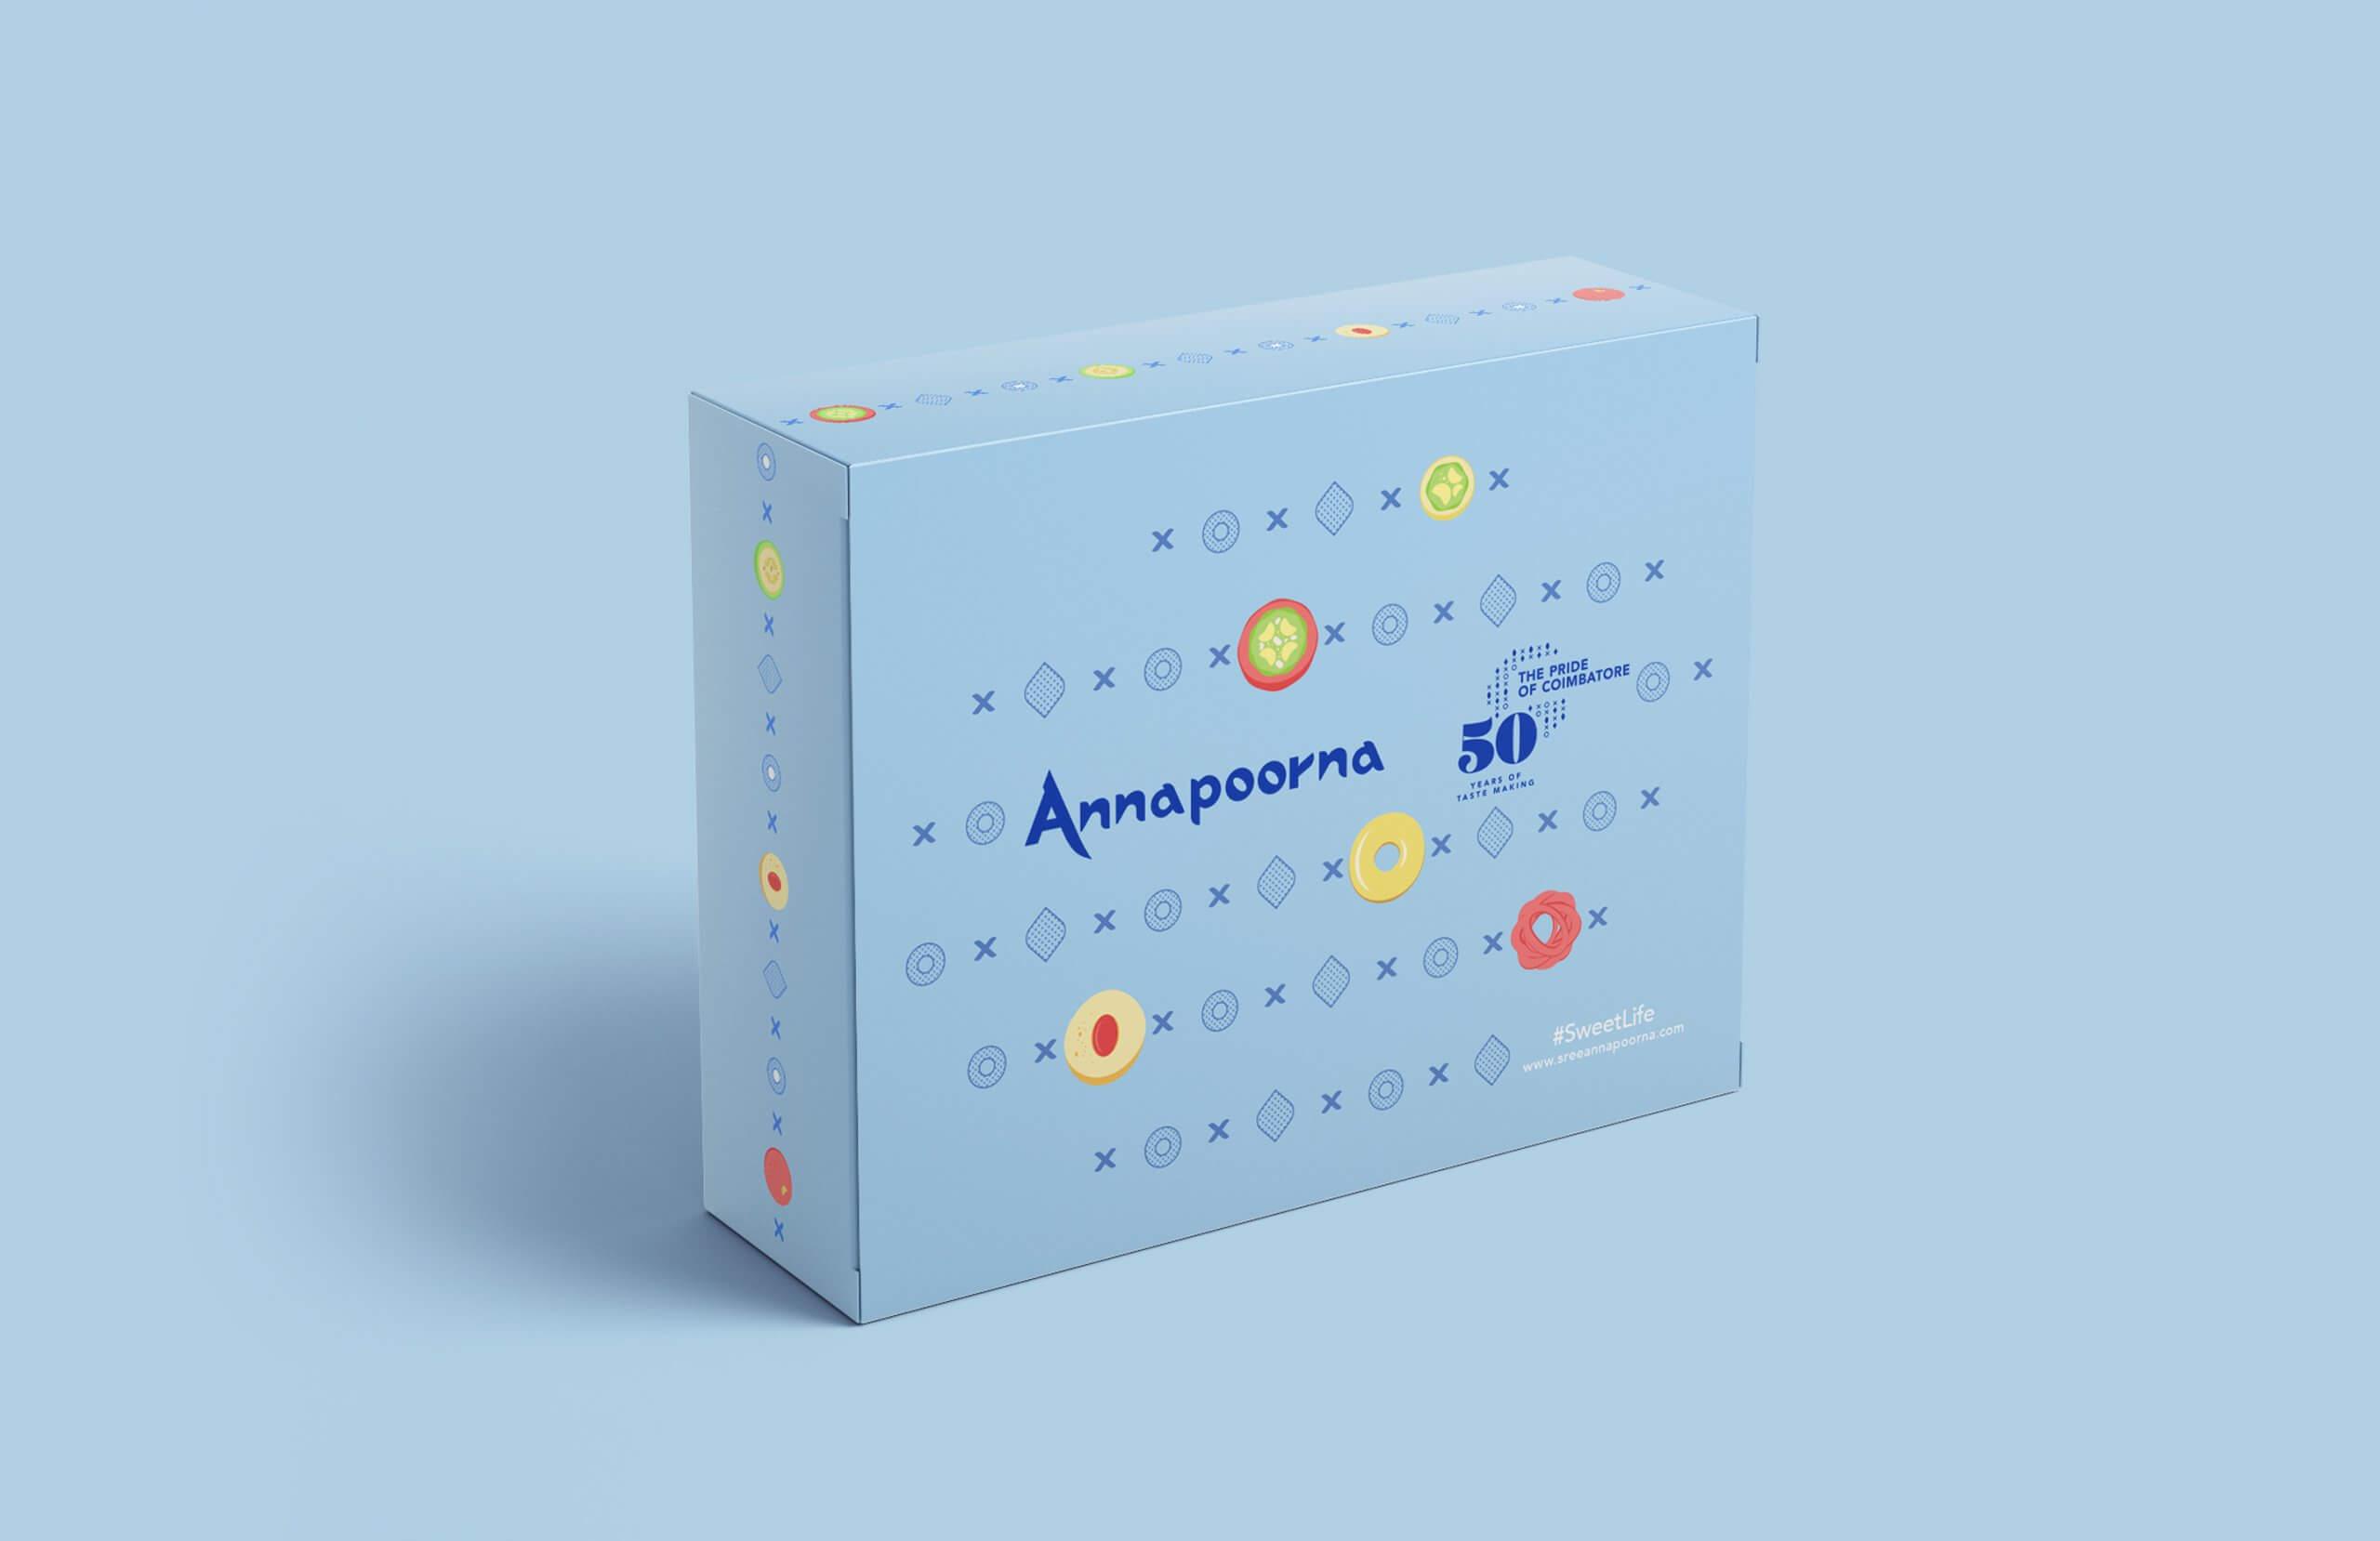 Annapoorna_Box_v06_2020